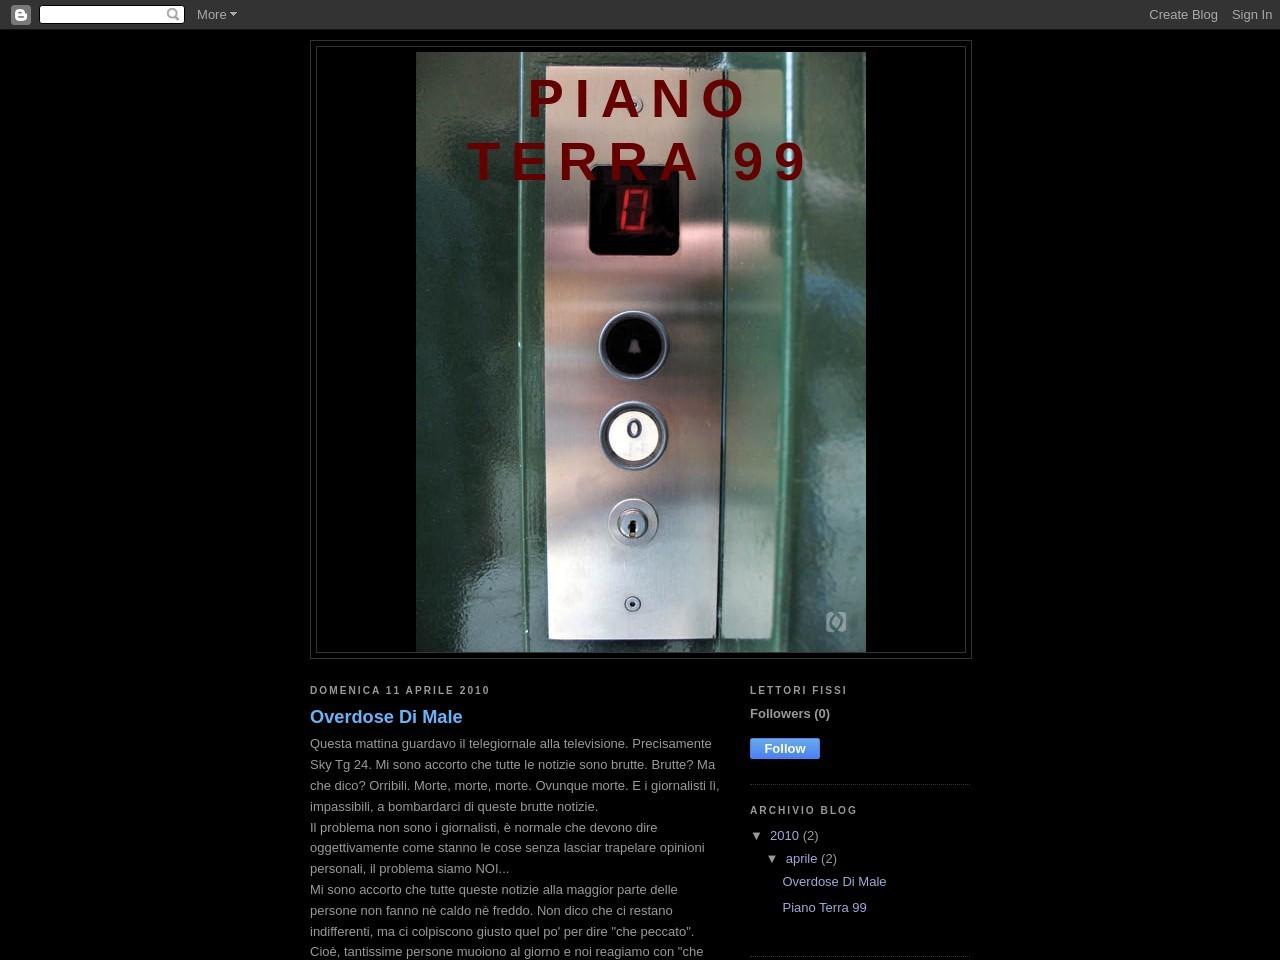 pianoterra99